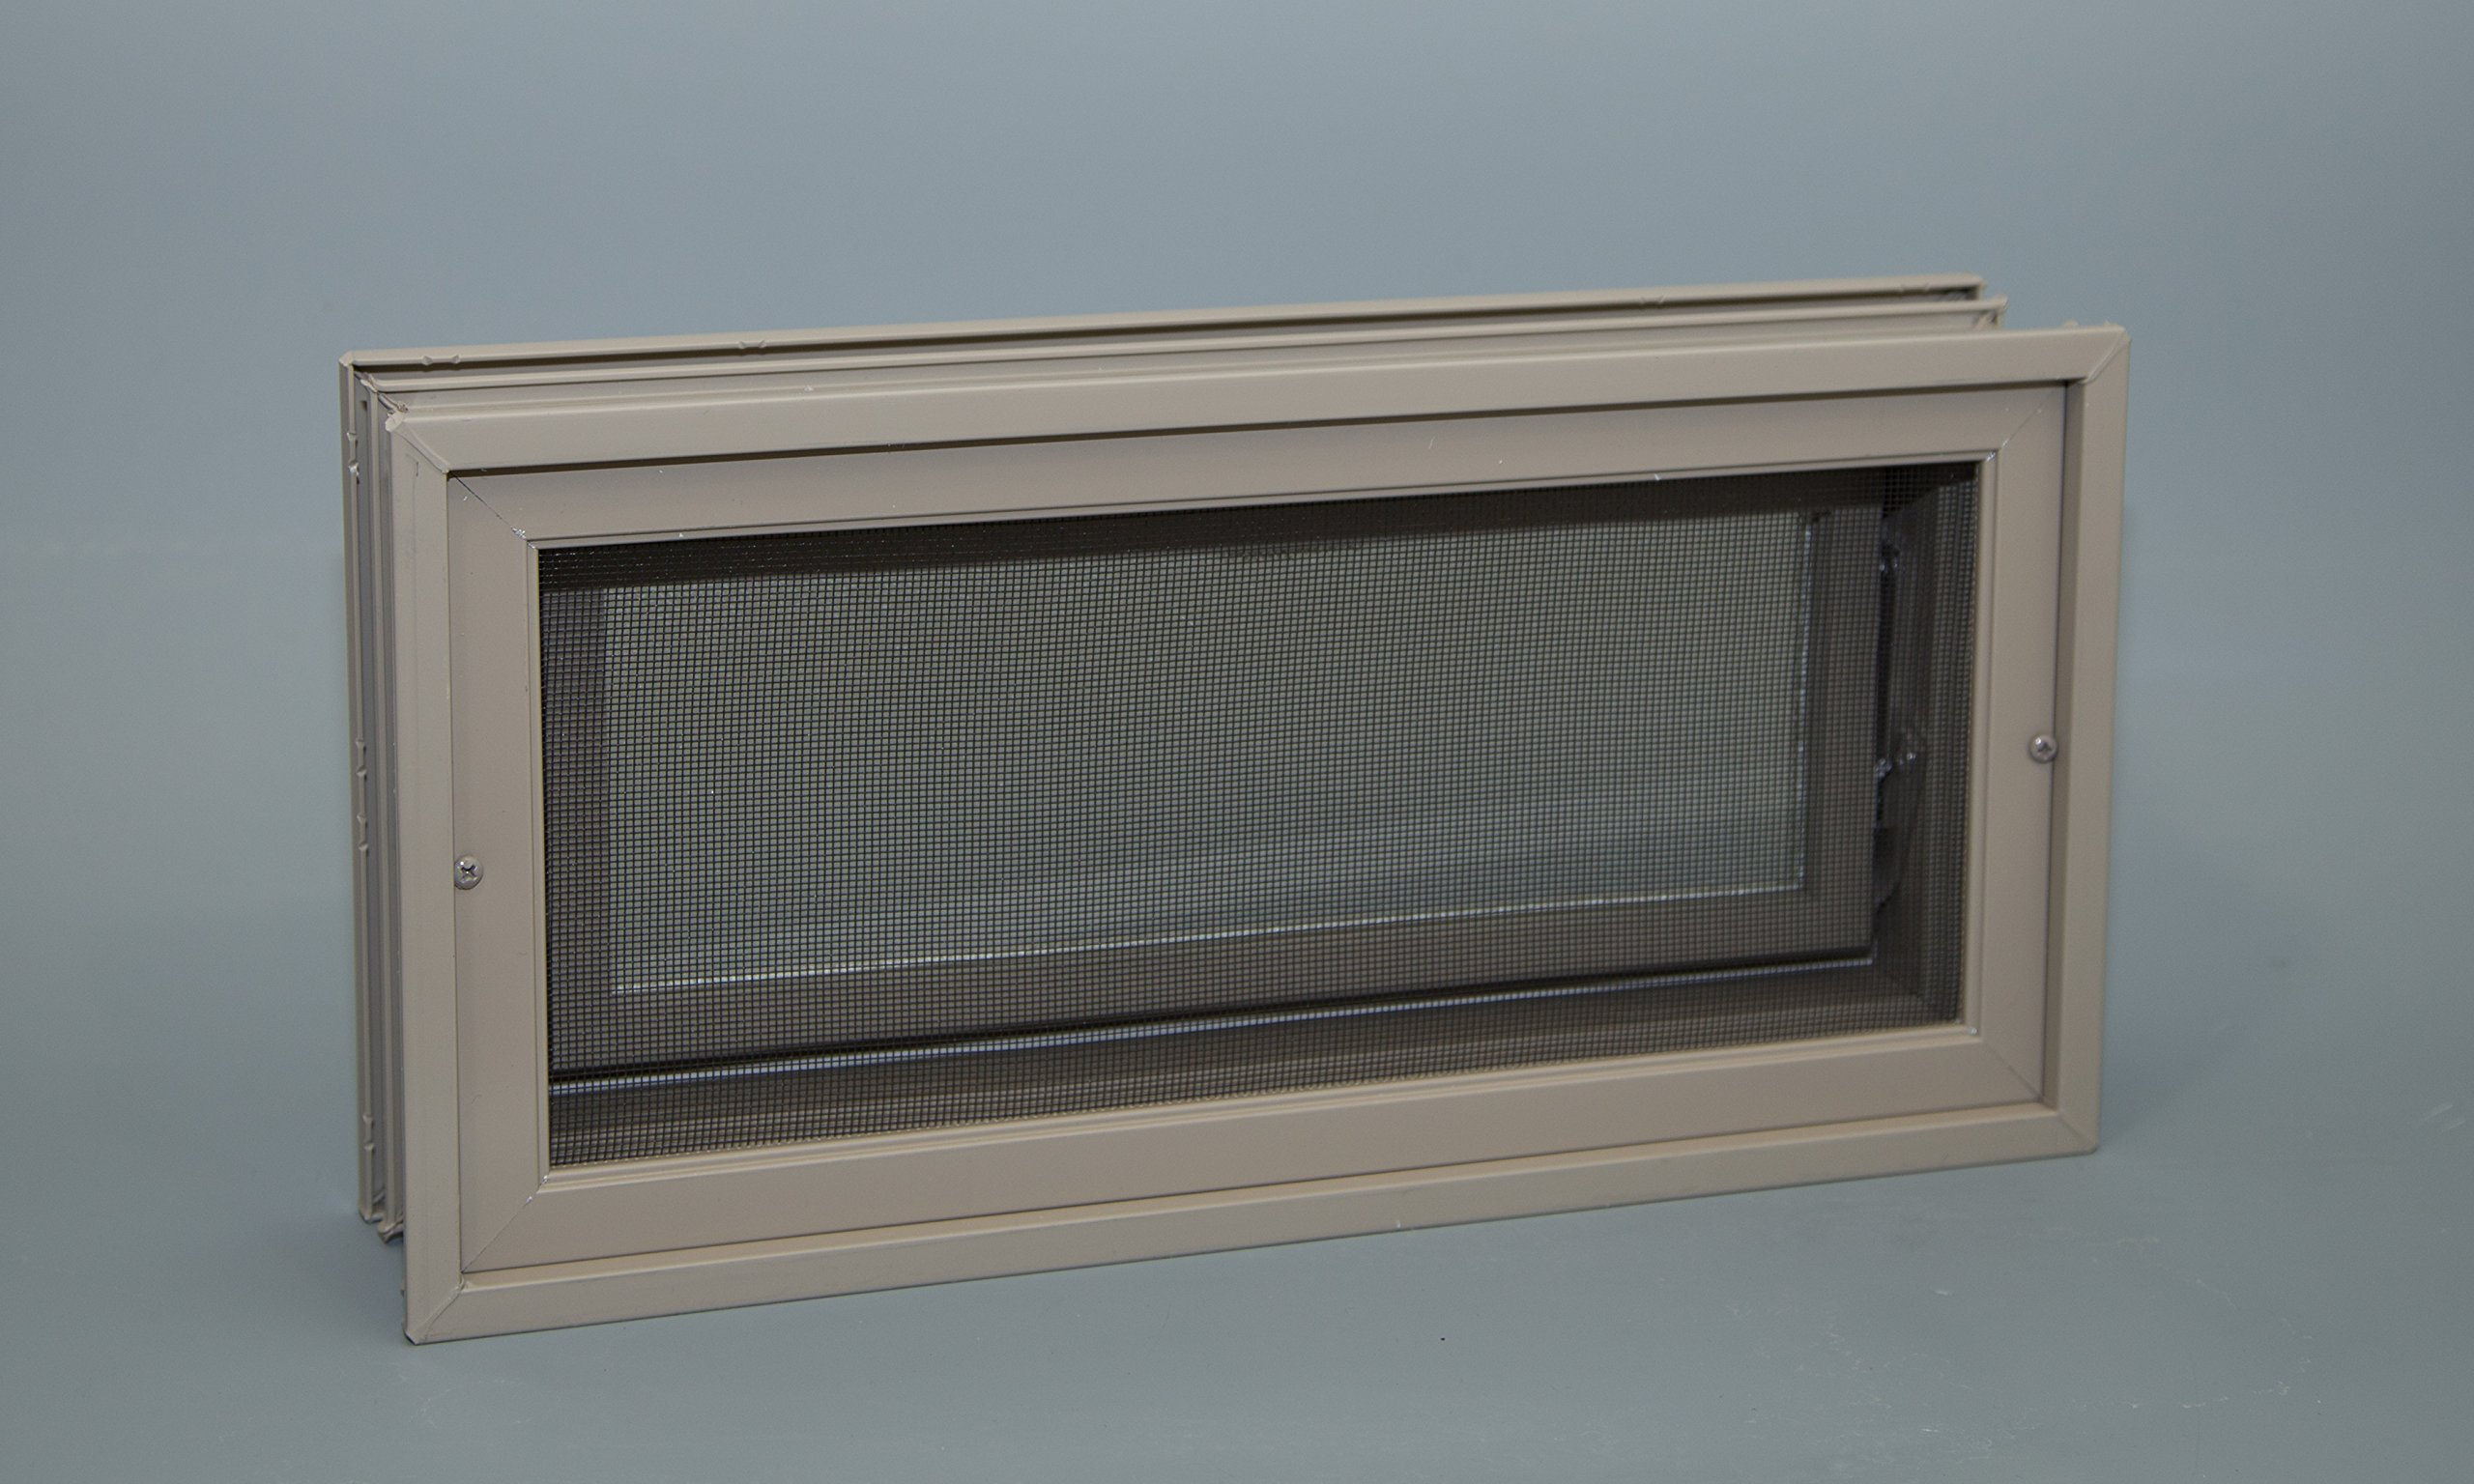 Glass Block Hopper Vent - 16'' W x 8'' H Vinyl Hopper Vent (Clay)